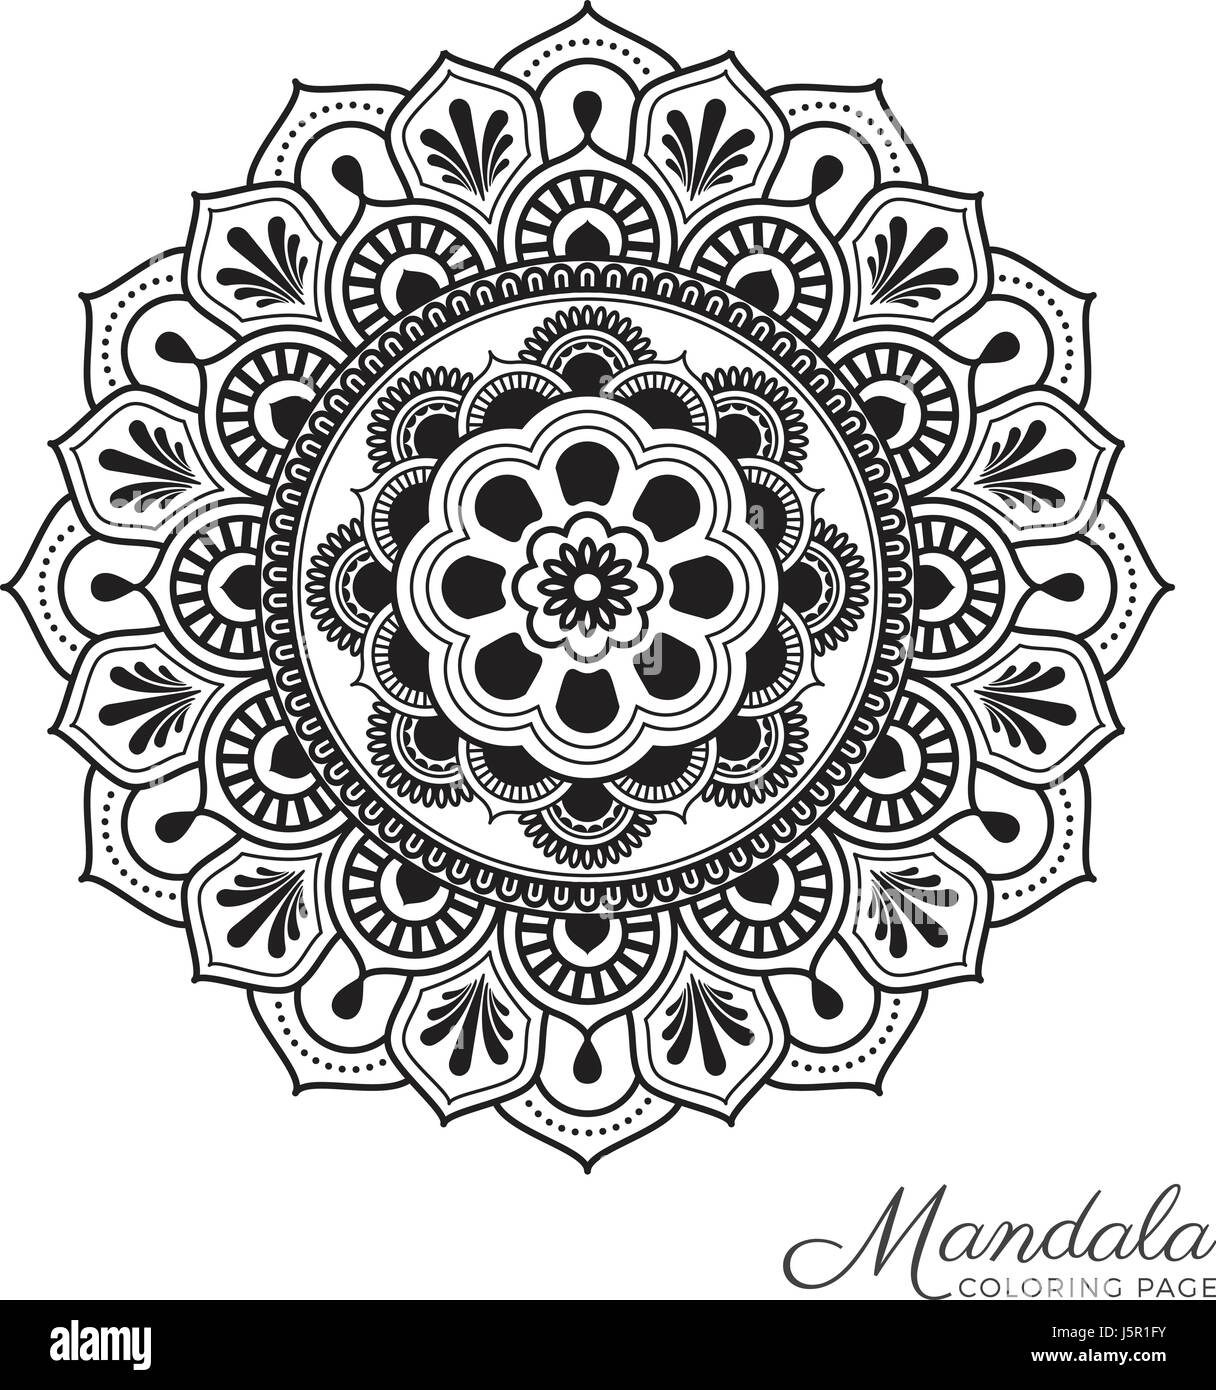 Mandala Dekorative Ornament Design Fur Erwachsene Malvorlagen